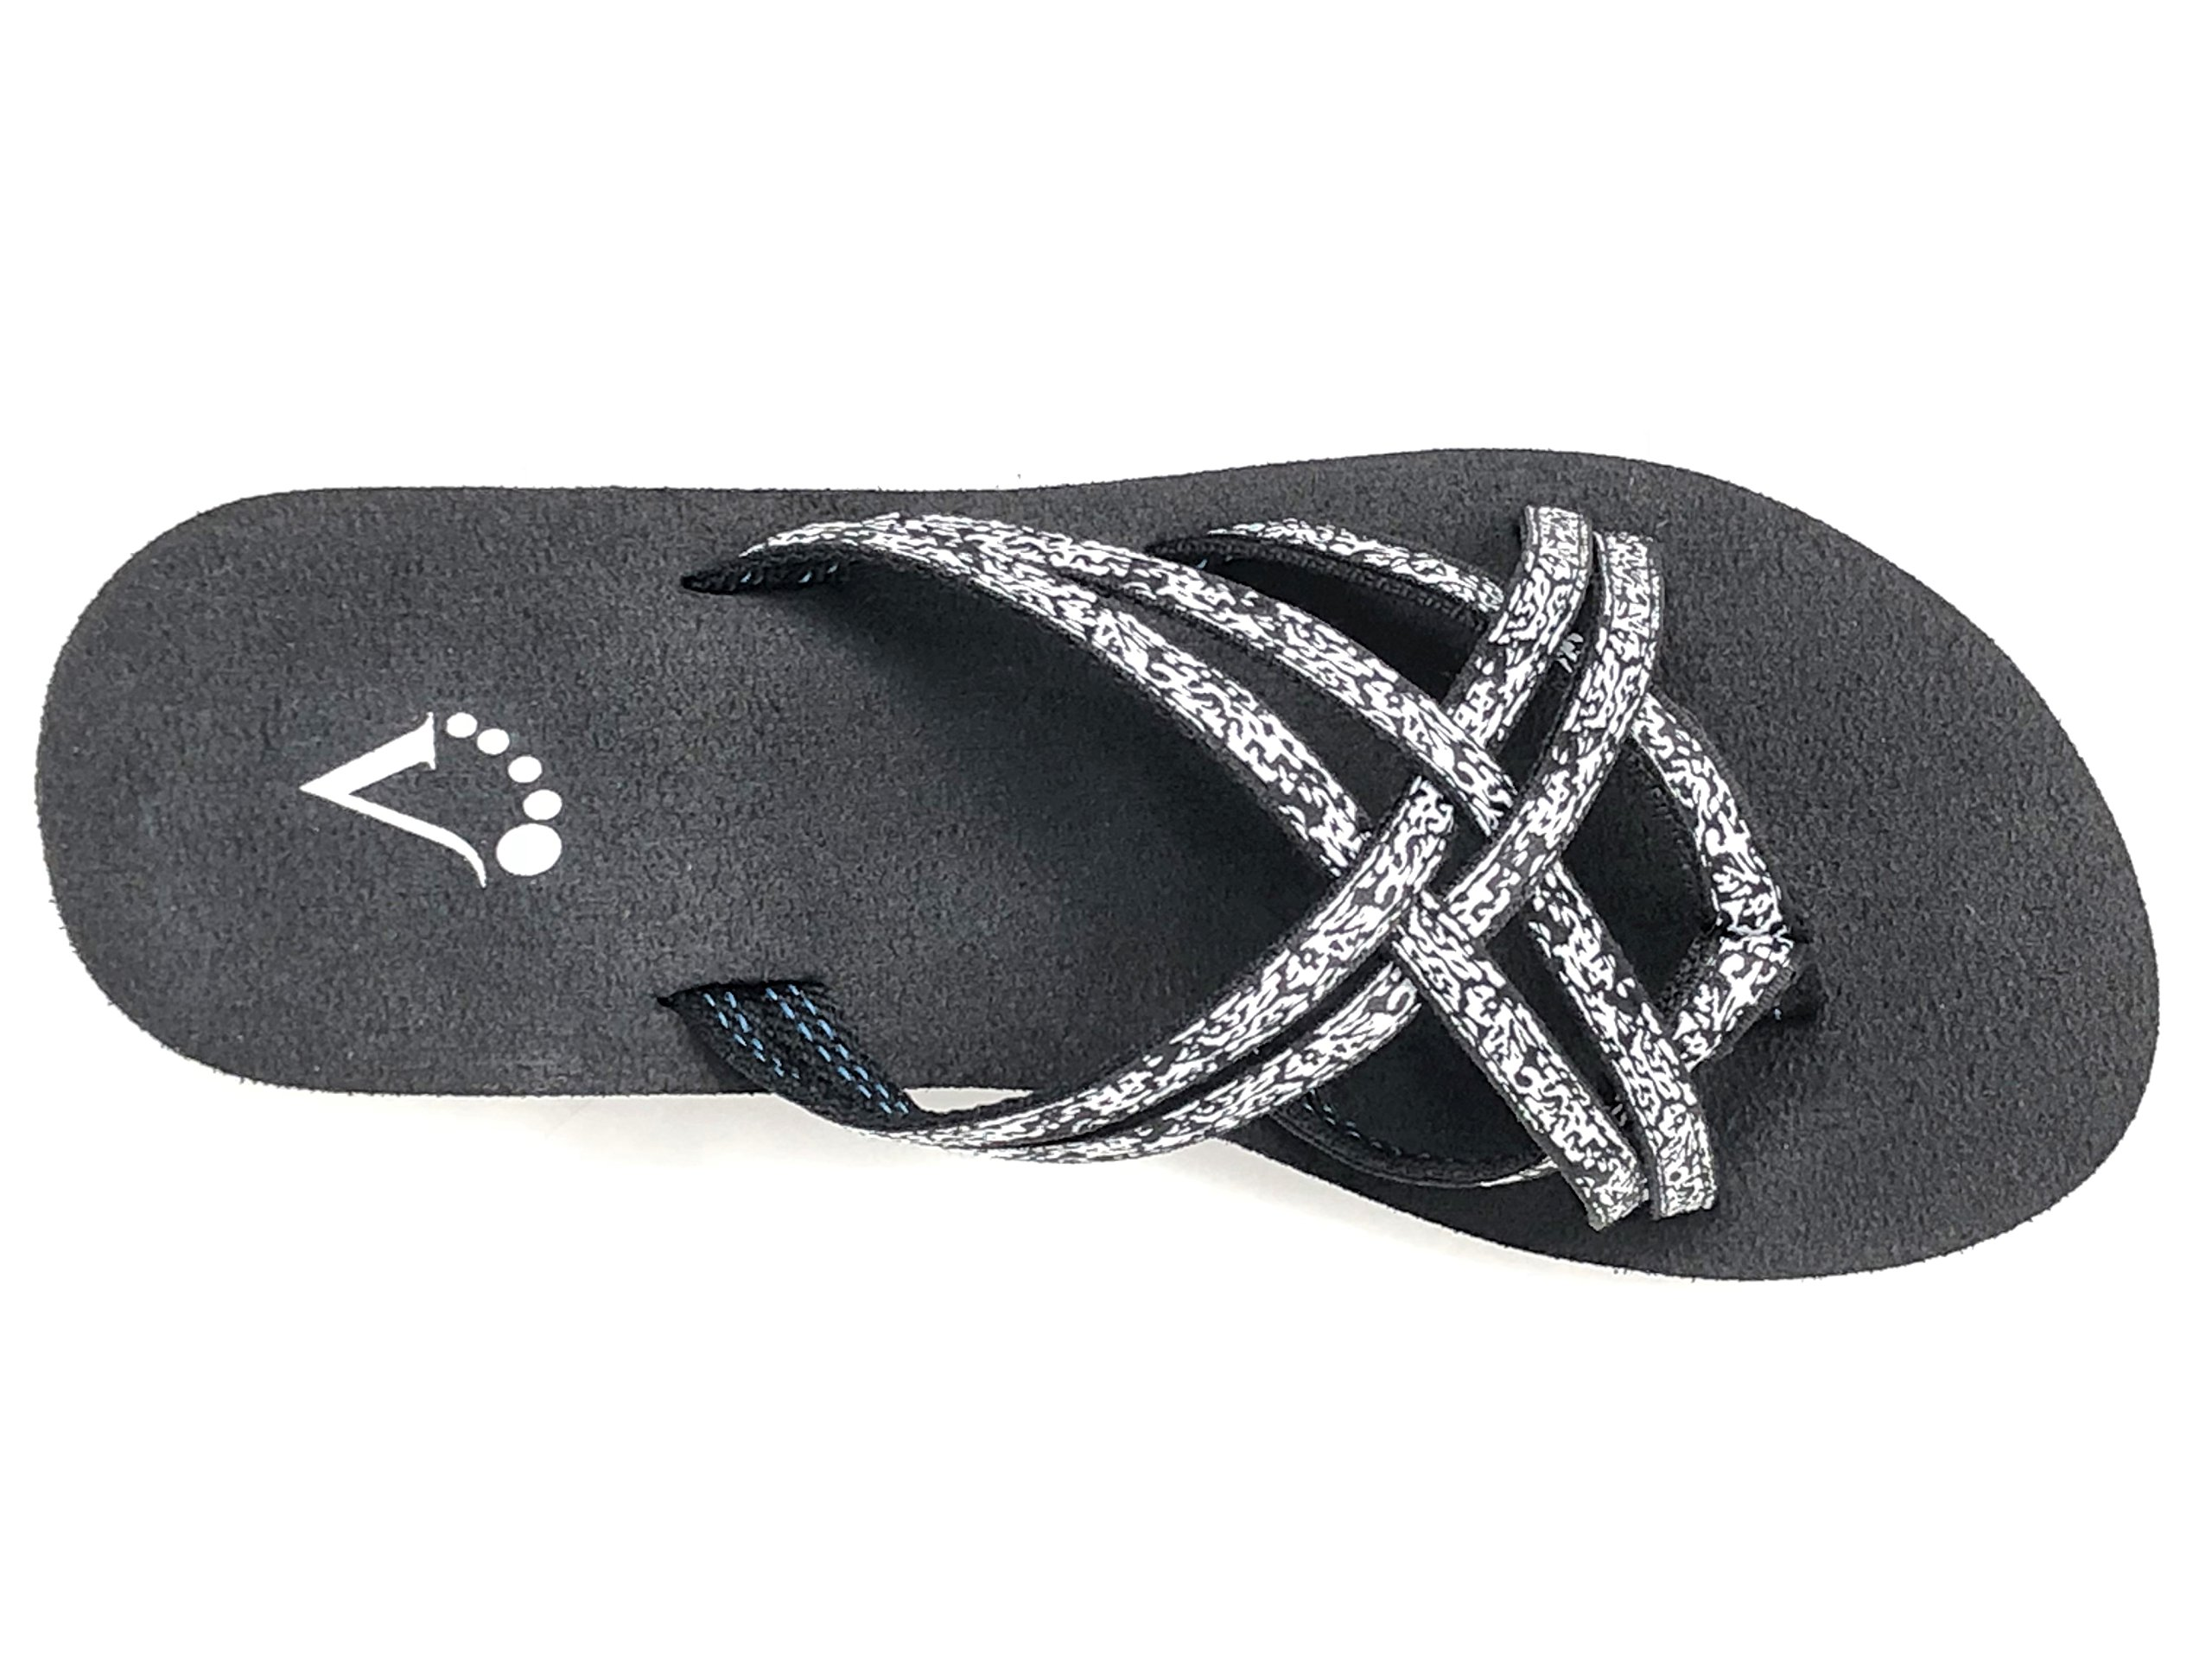 Viakix Wedge Flip Flops for Women – Comfortable, Stylish, Cute, Women's Strappy Sandal for Walking, Beach, Travel by Viakix (Image #5)